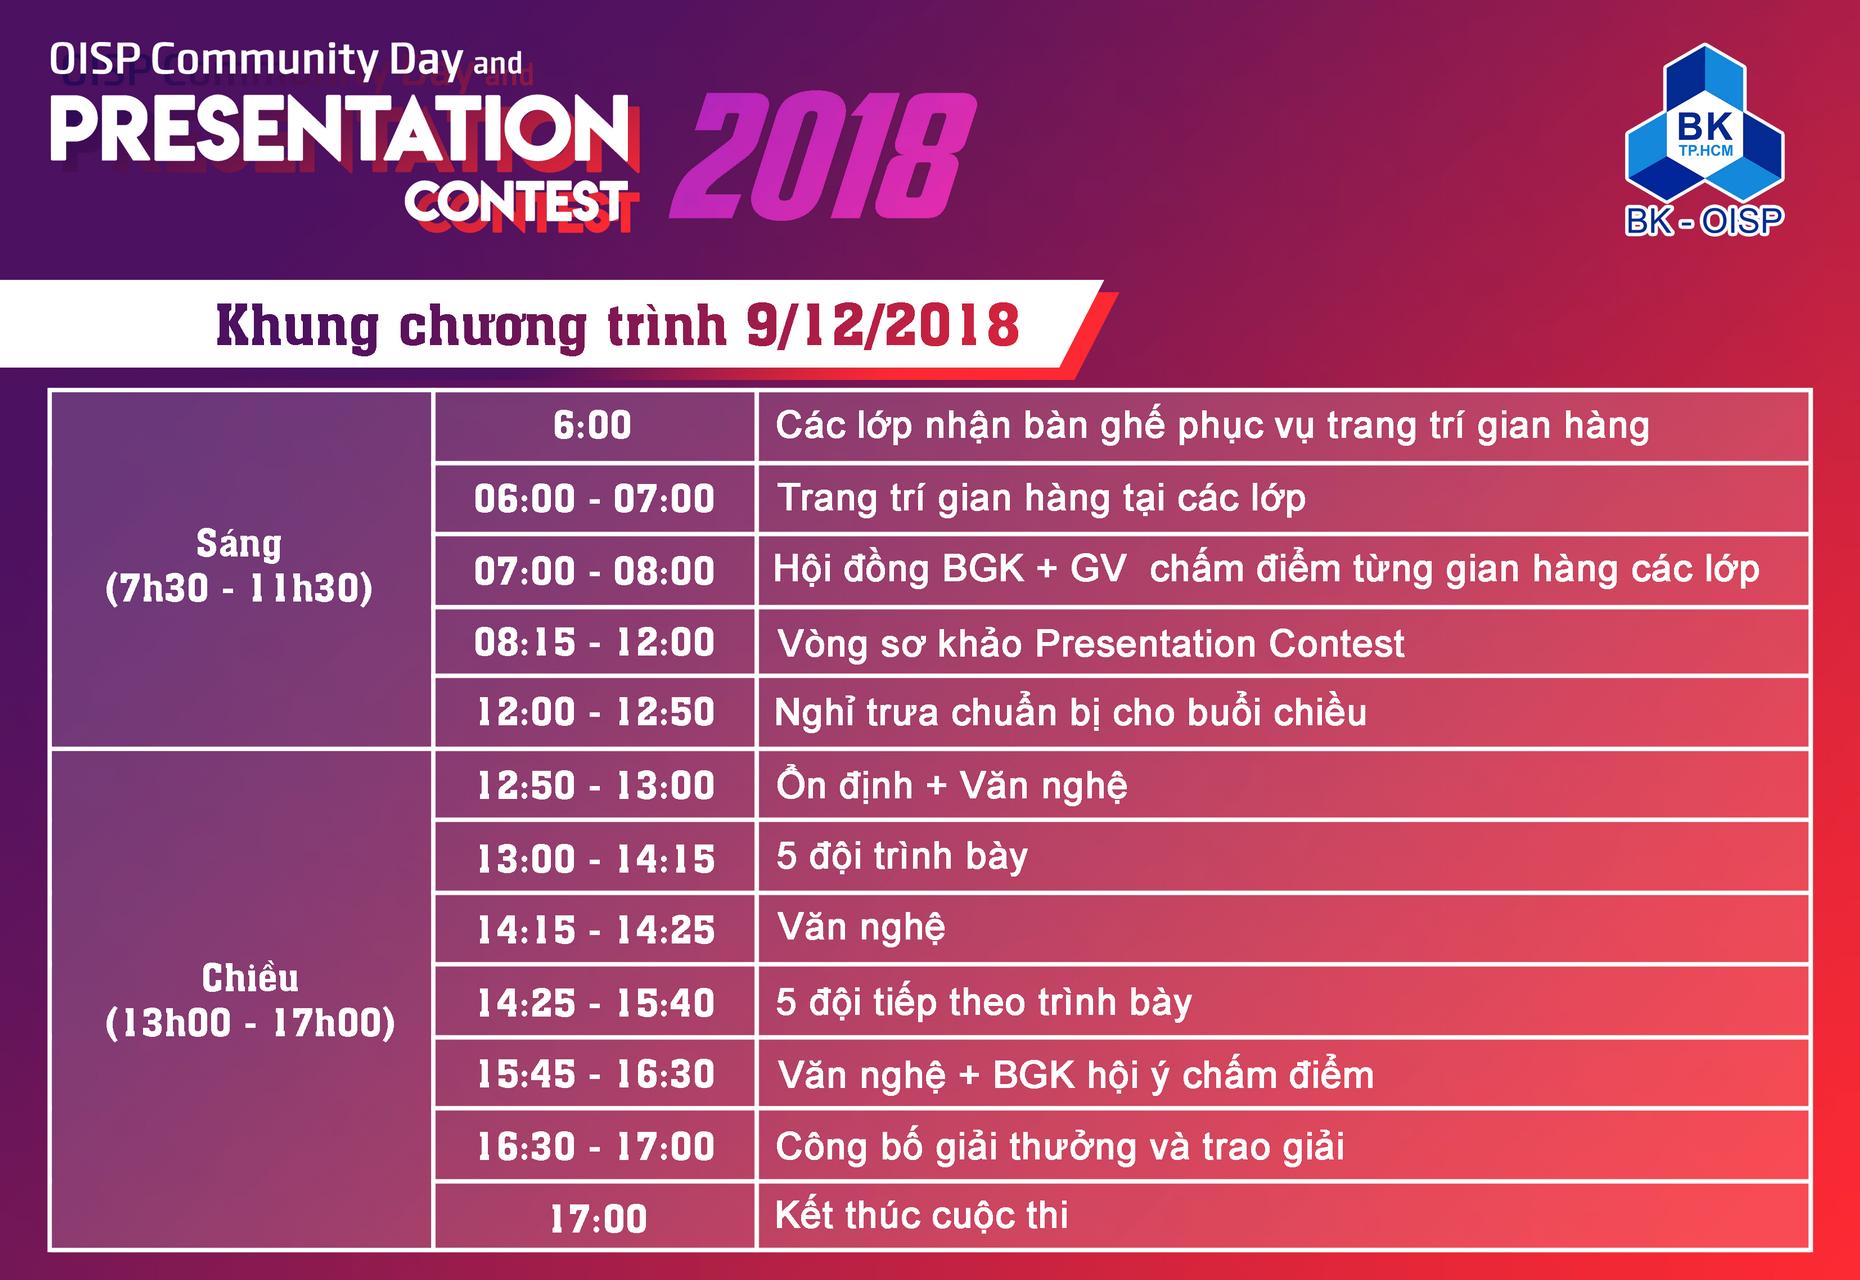 Community Day Presentation Contest 2018